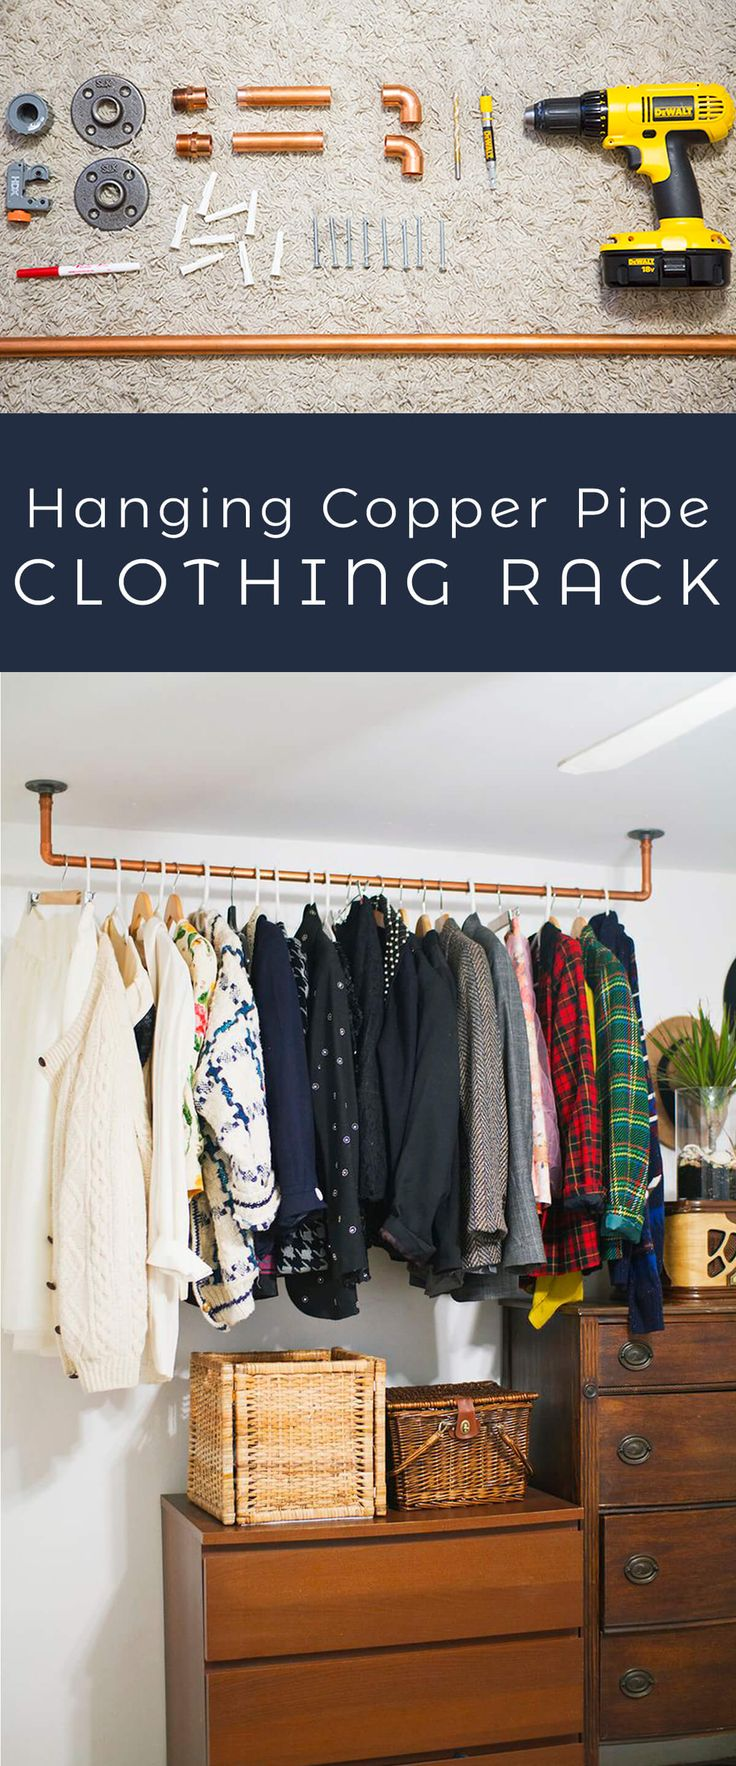 Hanging copper pipe clothing rack DIY